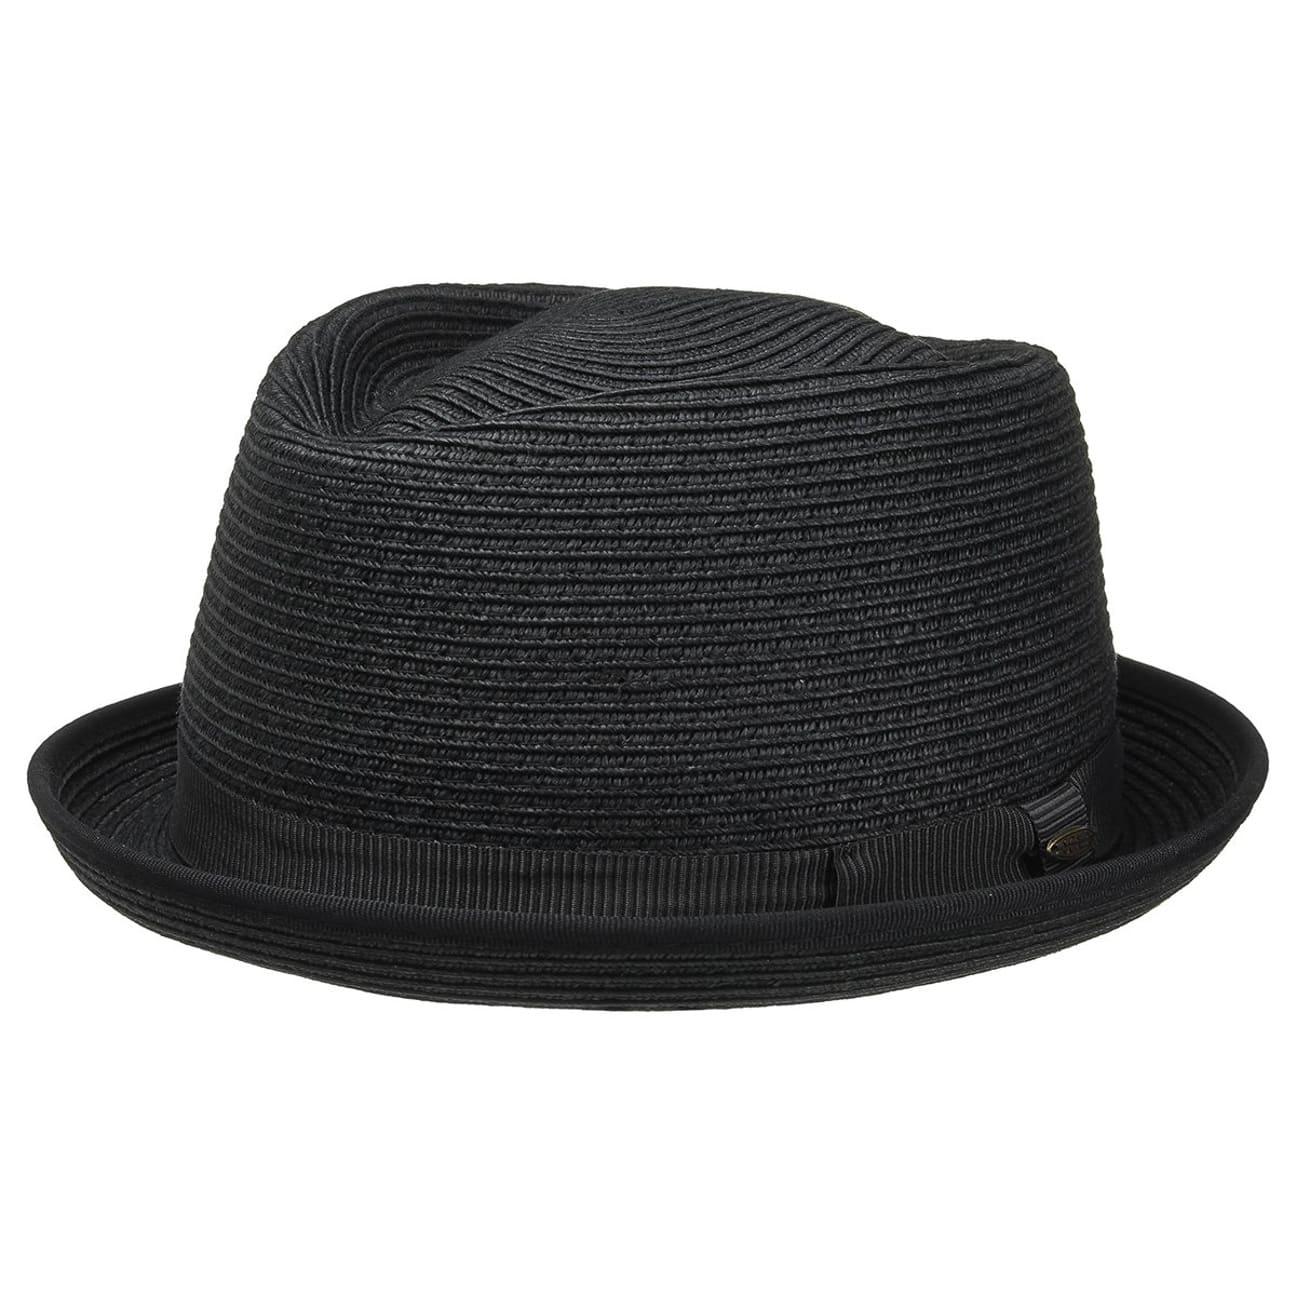 ... nero 6 · Diamond Cappello Pork Pie - natura 6 ... 4dbcc3573124